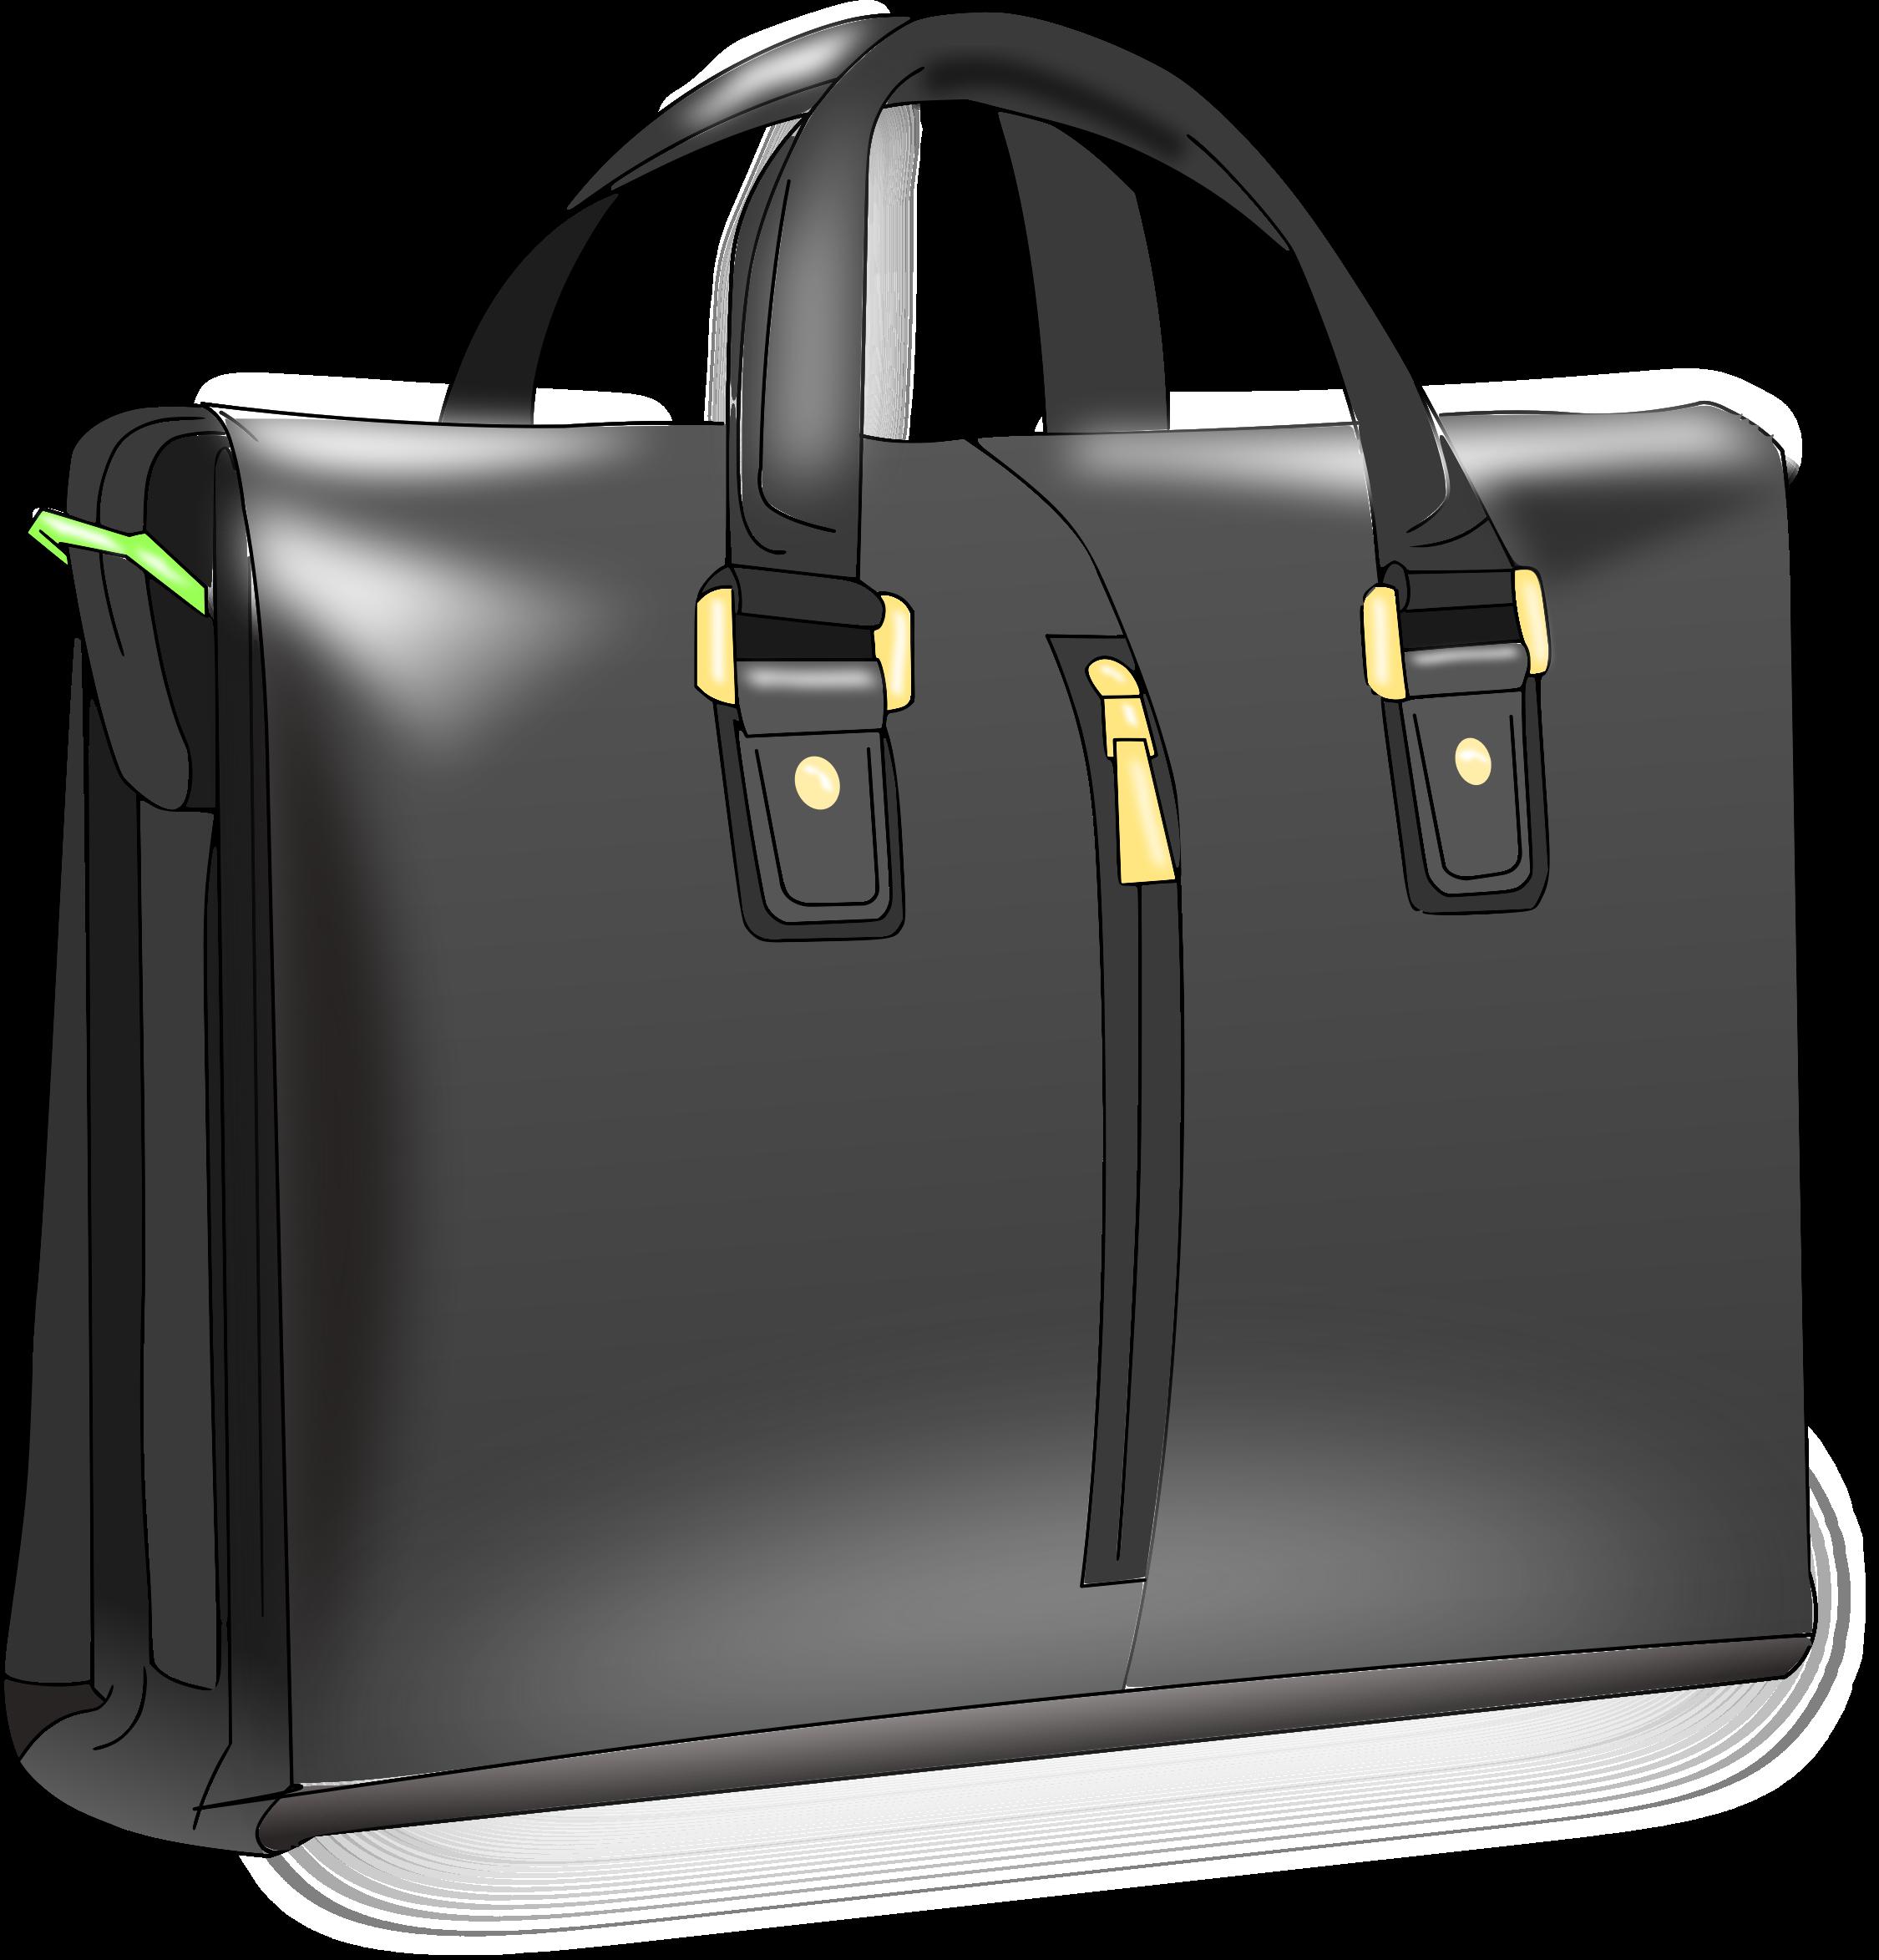 Man handbag big image. Men clipart suitcase